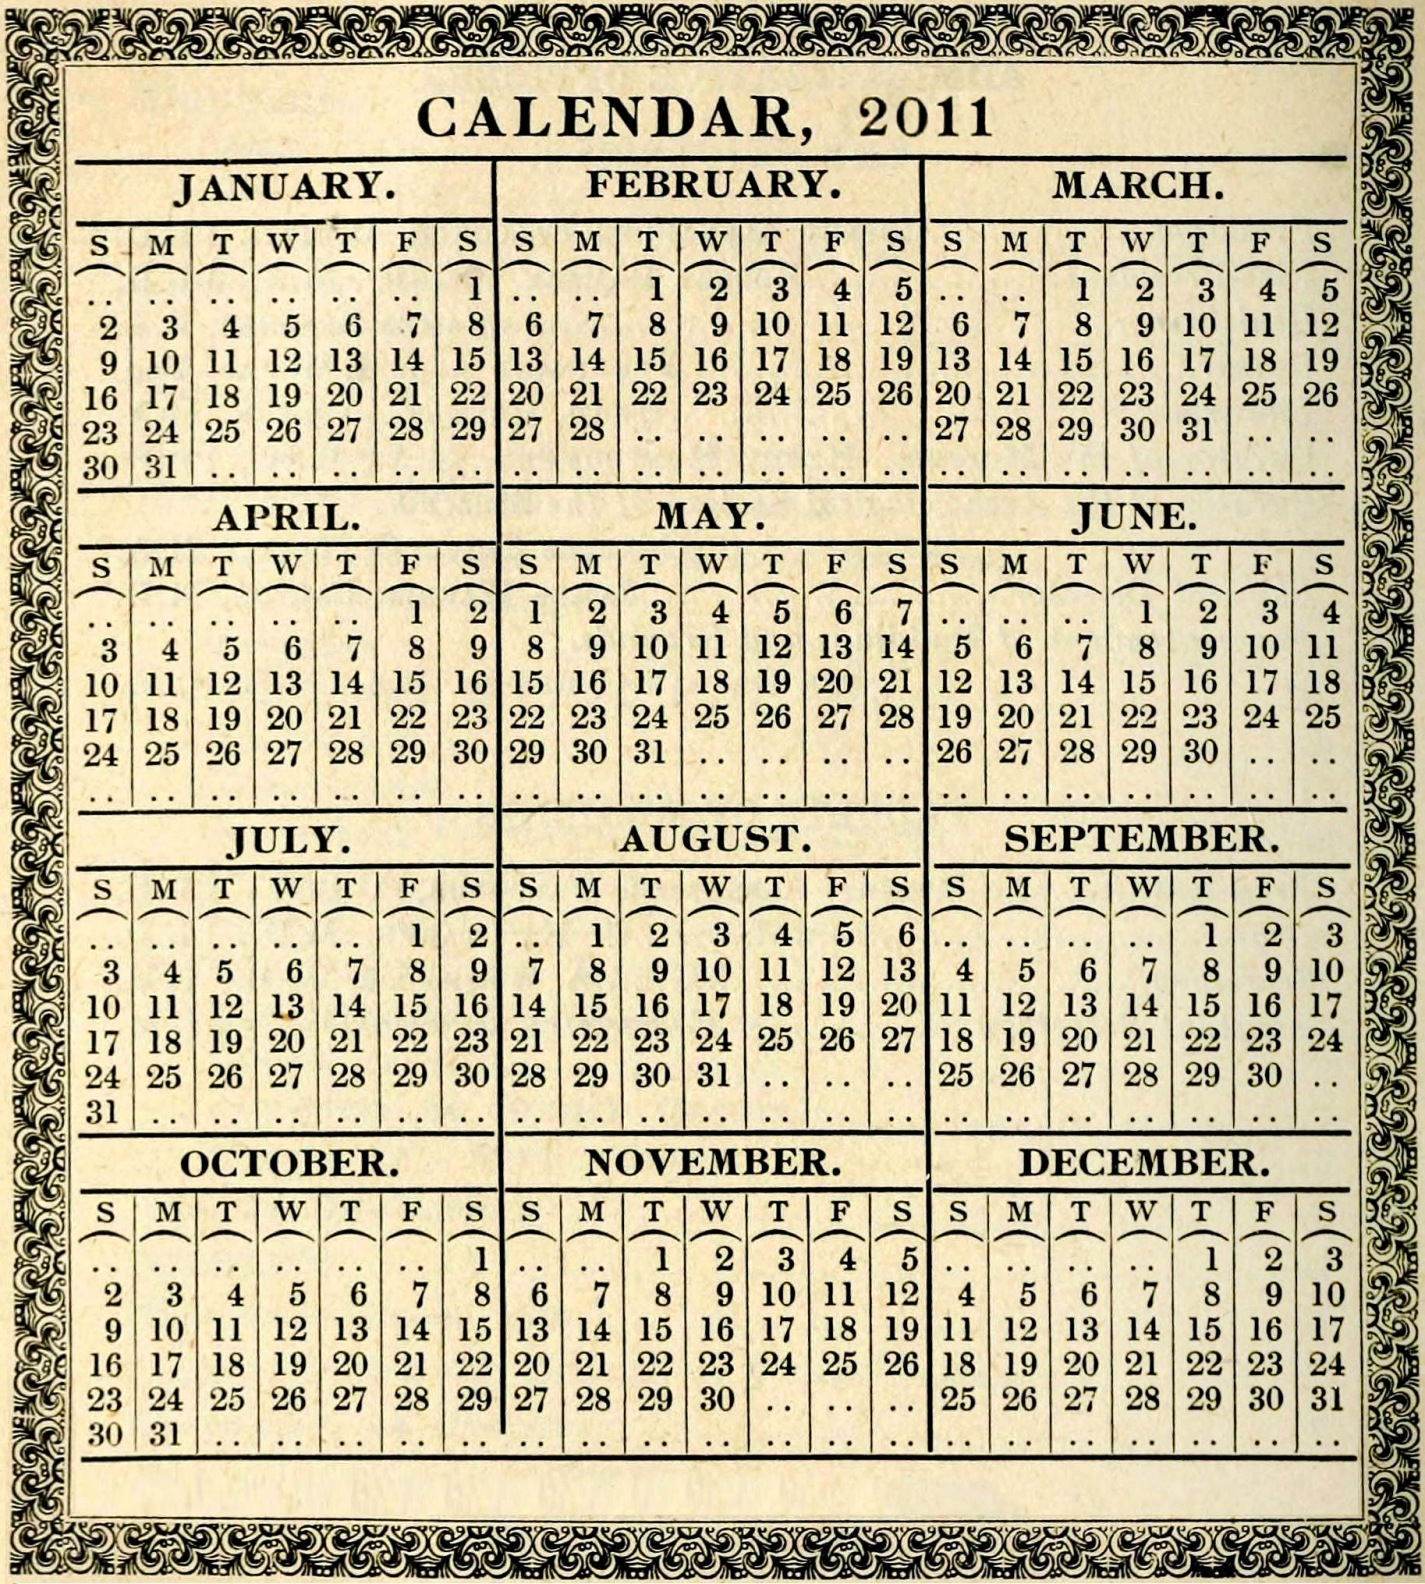 How To Make A Calendar Using Html Make A Jesse Tree Advent Calendar To Celebrate Christmas Crafty Secrets Heartwarming Vintage Ideas And Tips